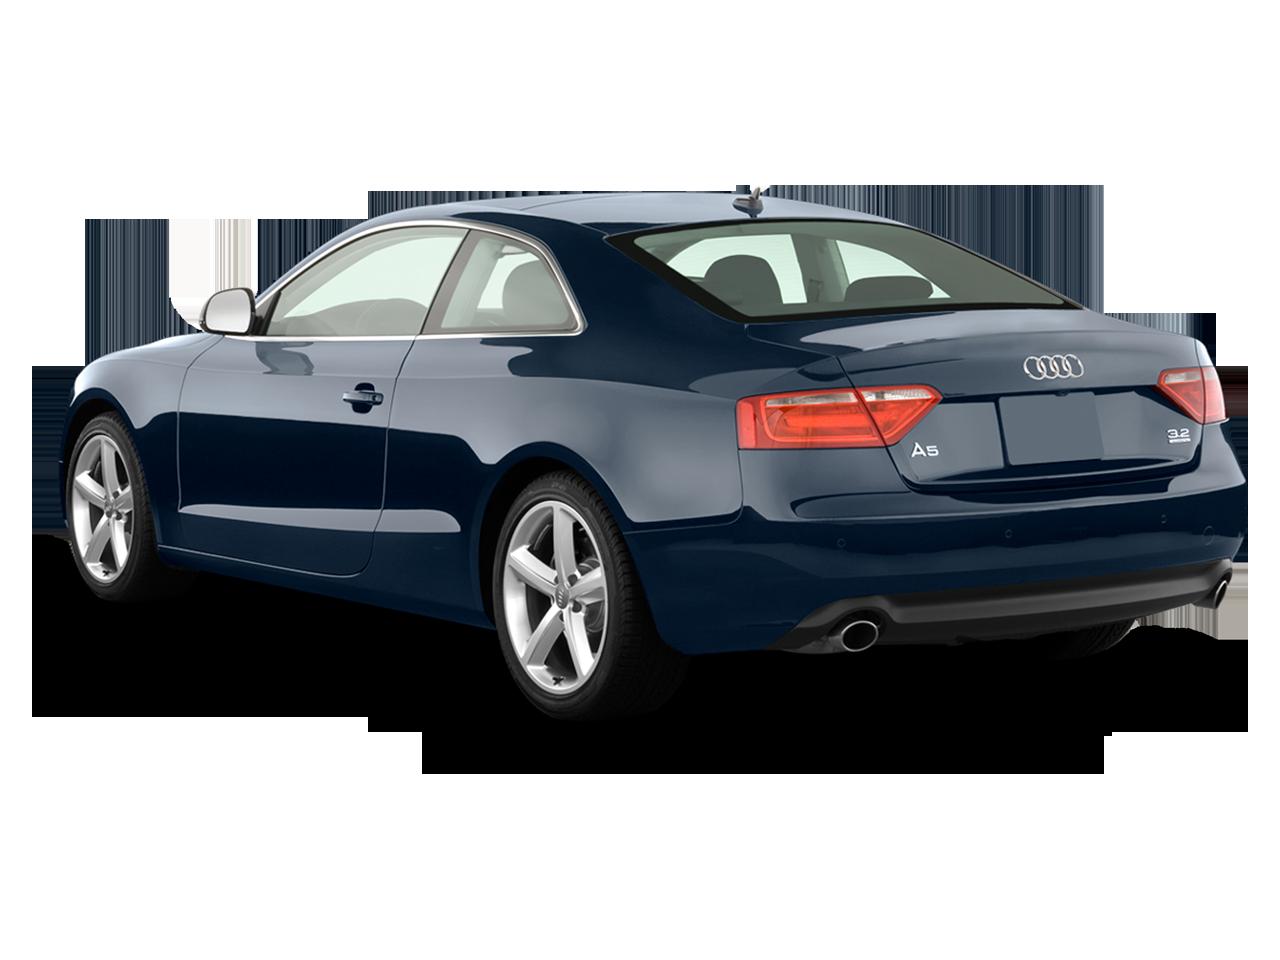 2011 audi a5 2.0 t quattro tiptronic premium plus coupe angular rear - 2011 Audi A5 Coupe 2 0 T At